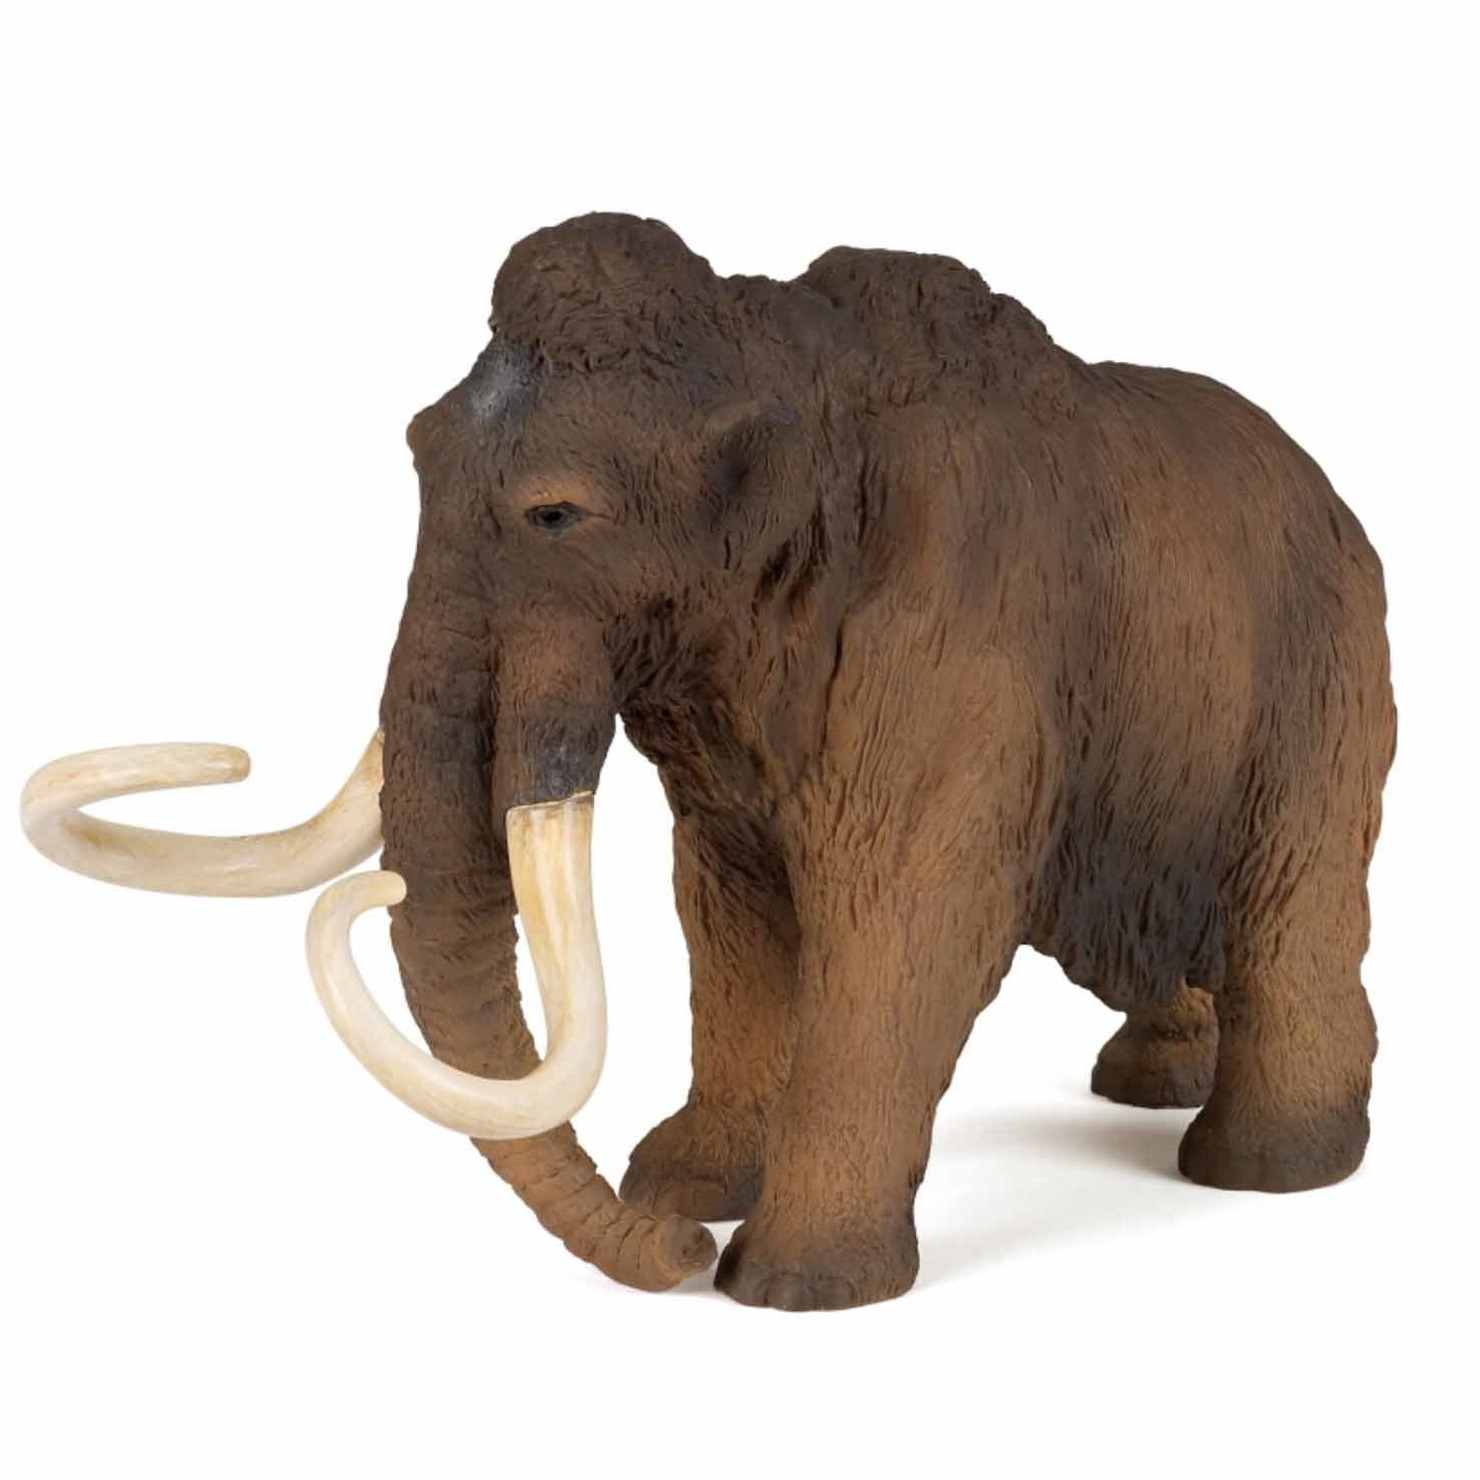 Plastic speelgoed mammoet 20 cm